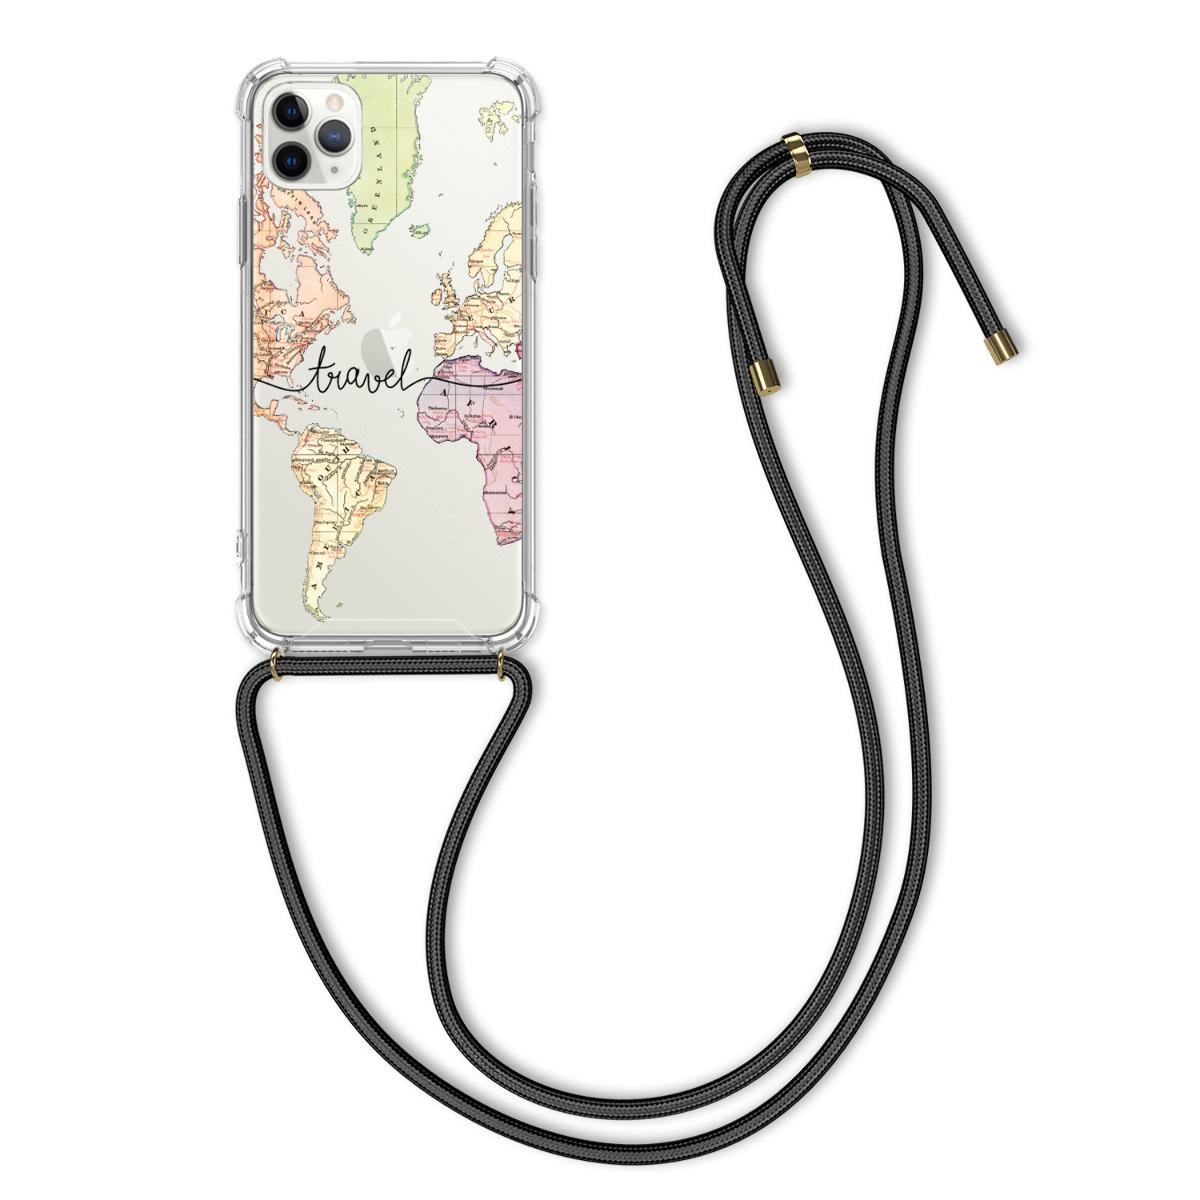 Kvalitní silikonové TPU pouzdro pro Apple iPhone 11 Pro - Travel Black | Multicolor | Transparent